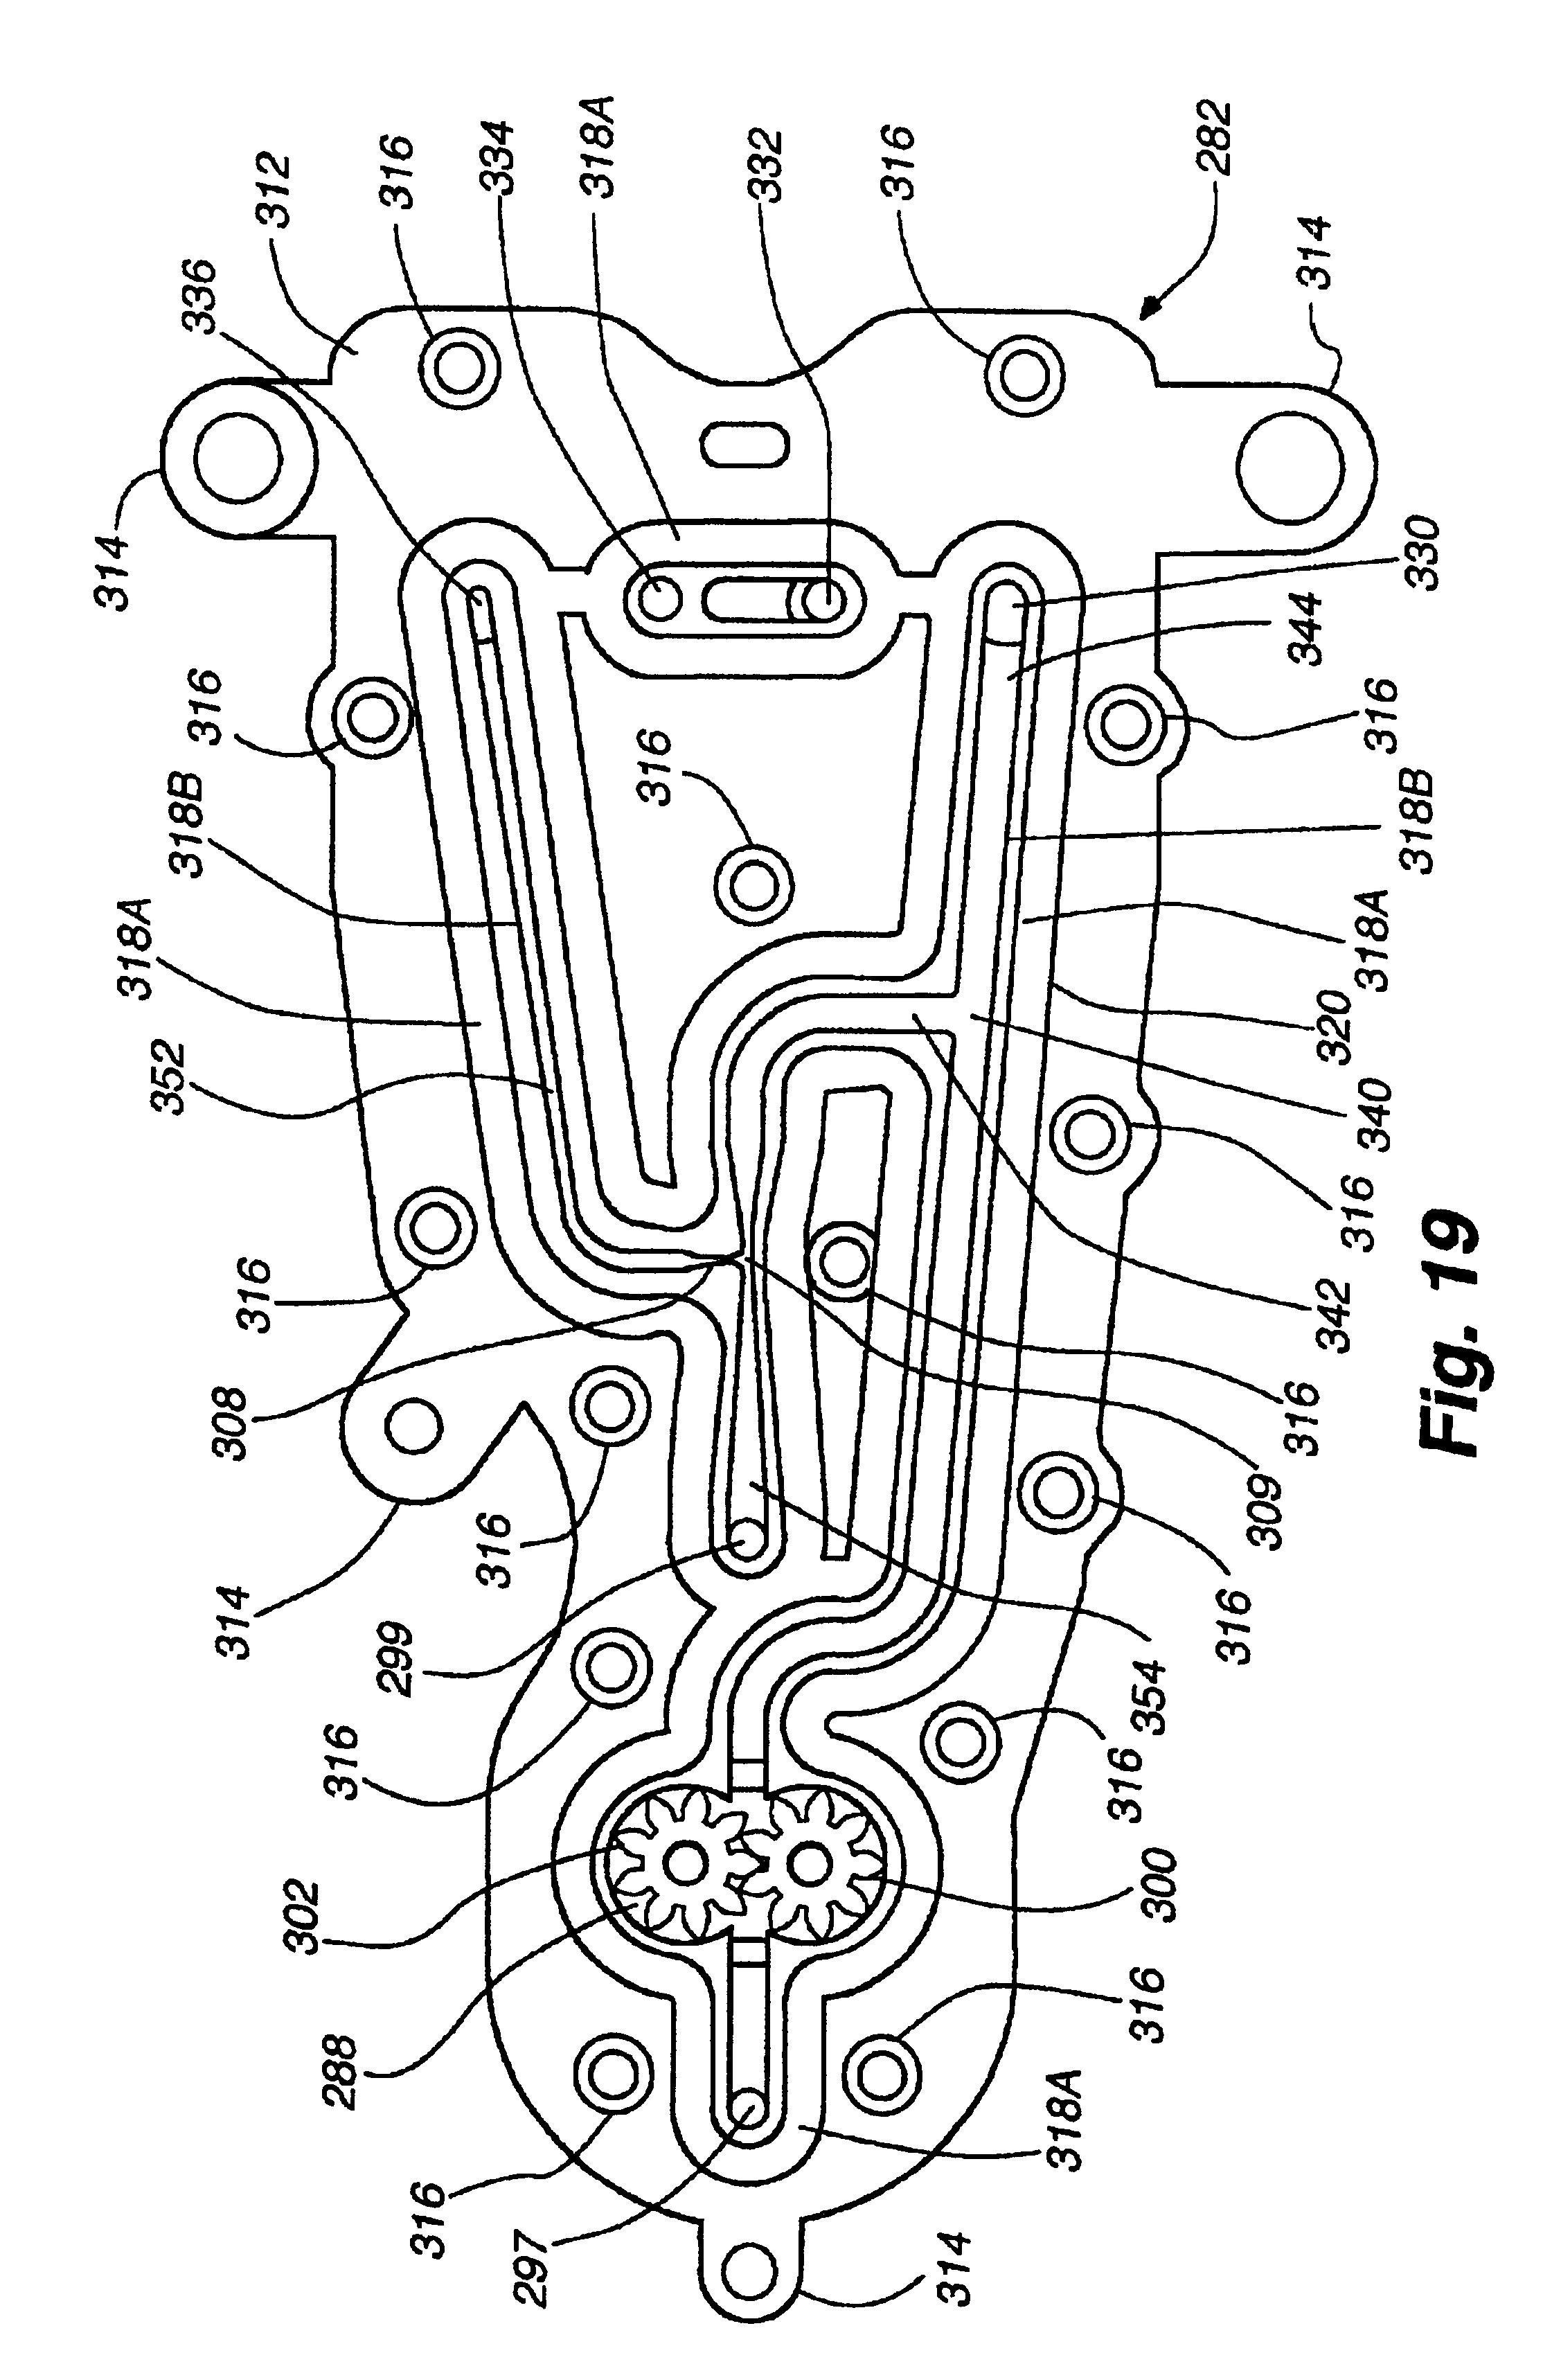 Patent US 6,964,739 B2